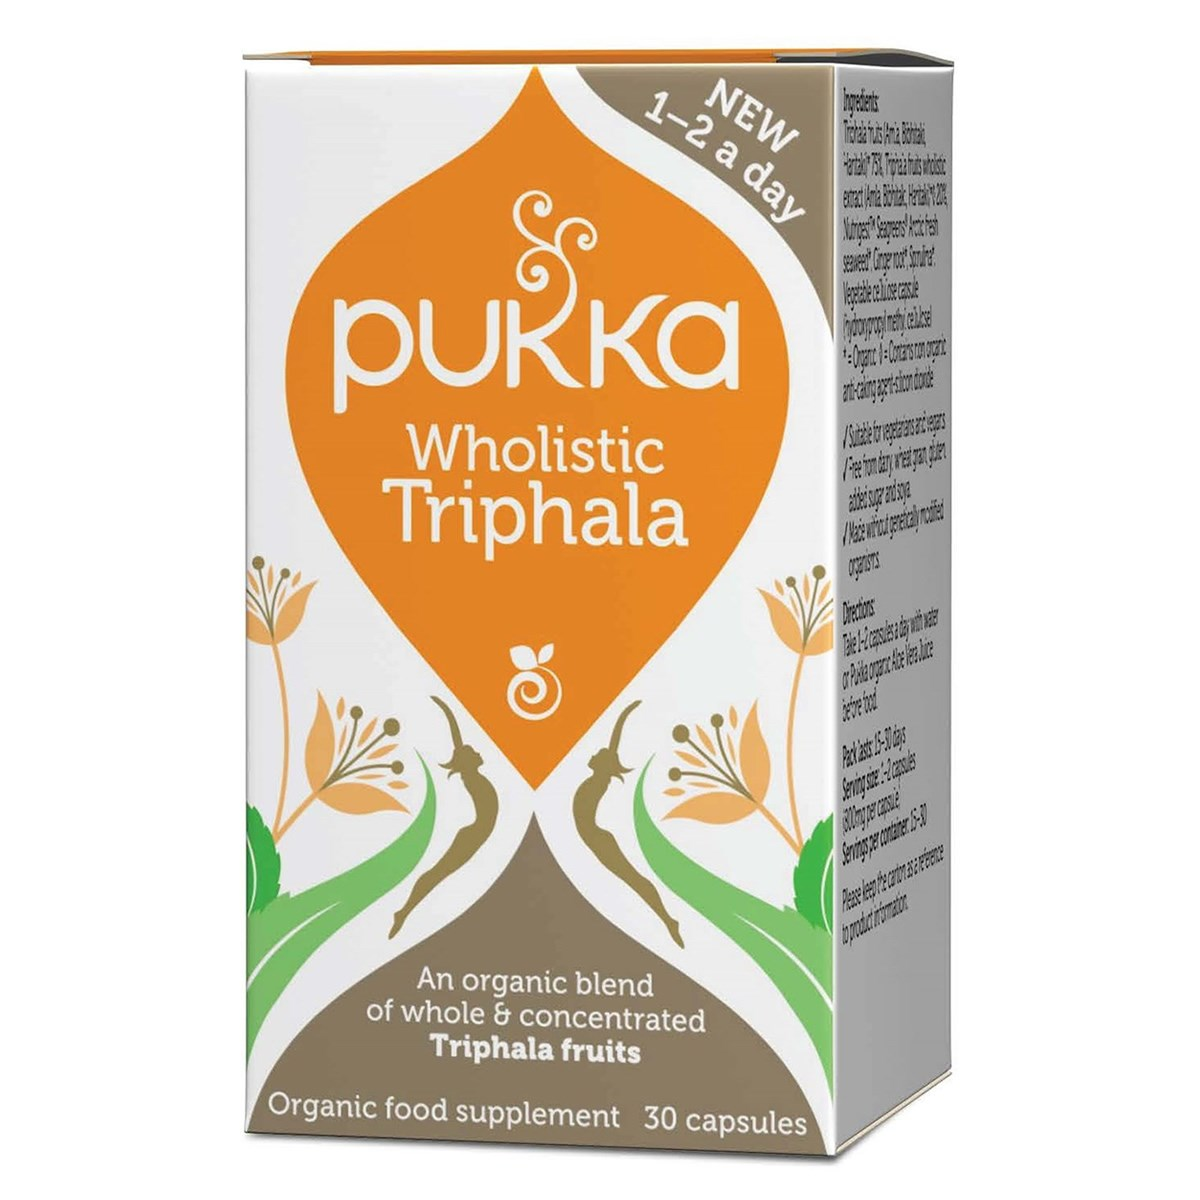 Pukka Wholistic Triphala Capsules